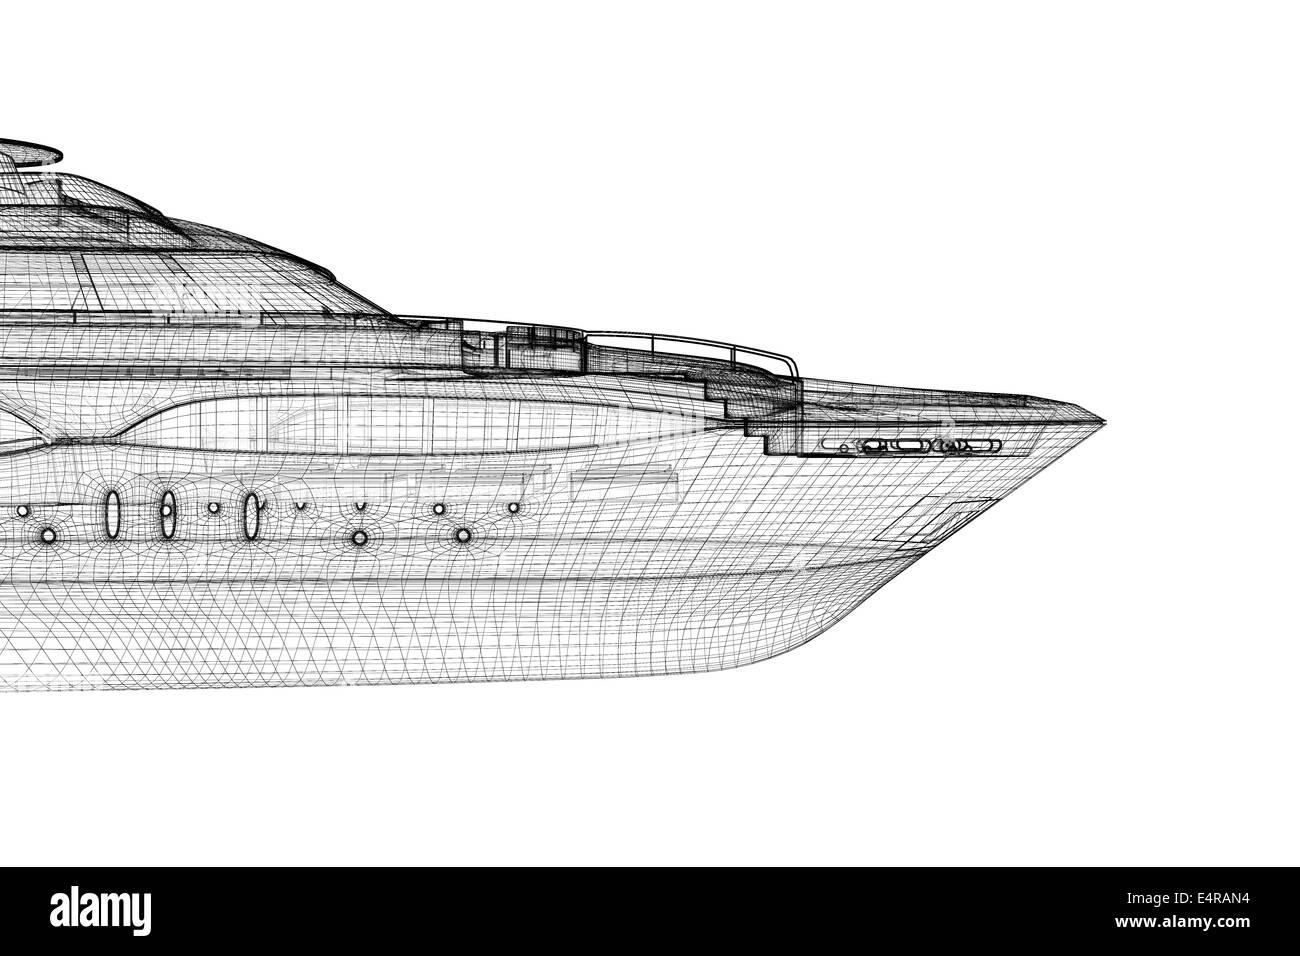 luxury motor yacht   3D model body structure, wire model Stock Photo